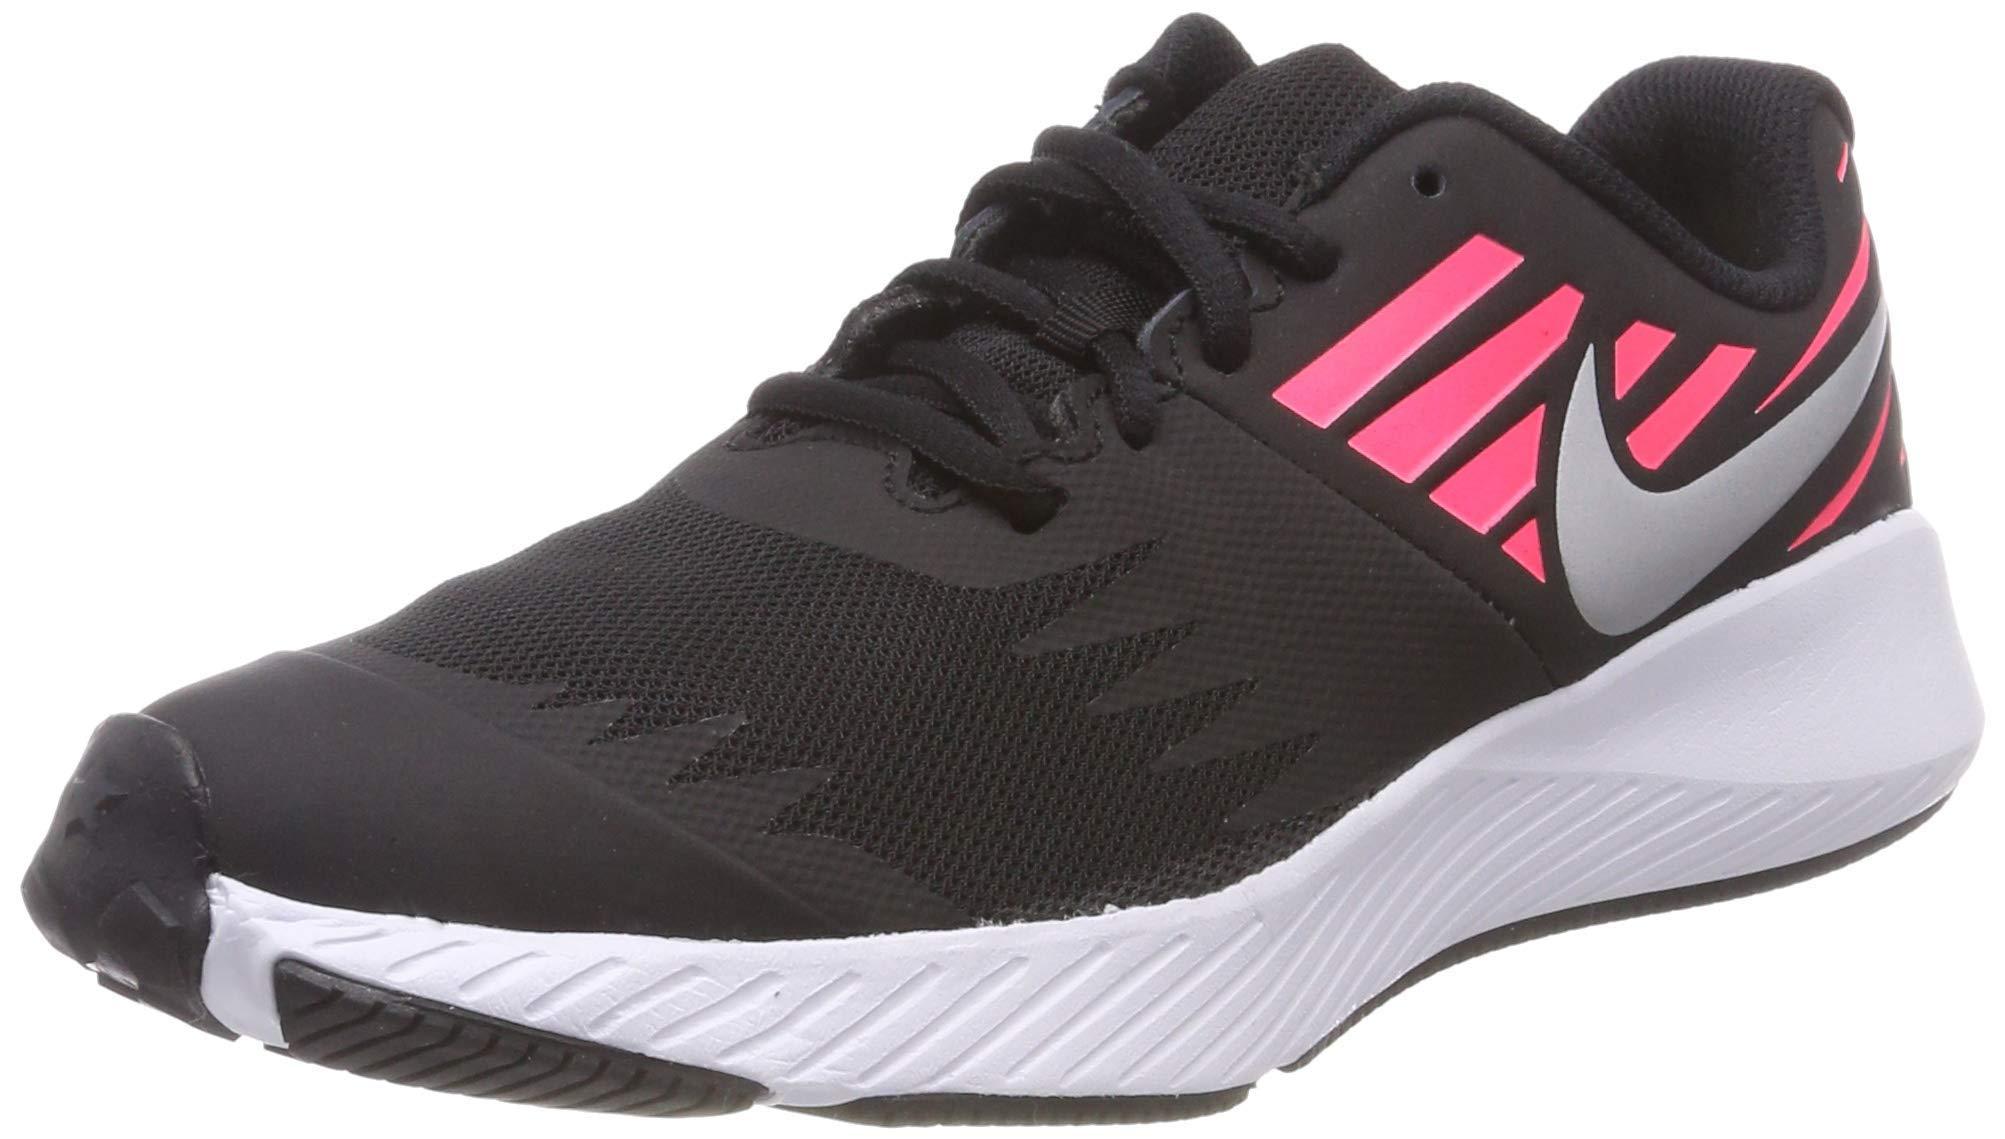 Nike Girl's Star Runner (GS) Running Shoe Black/Metallic Silver/Racer Pink/Volt Size 3.5 M US by Nike (Image #1)